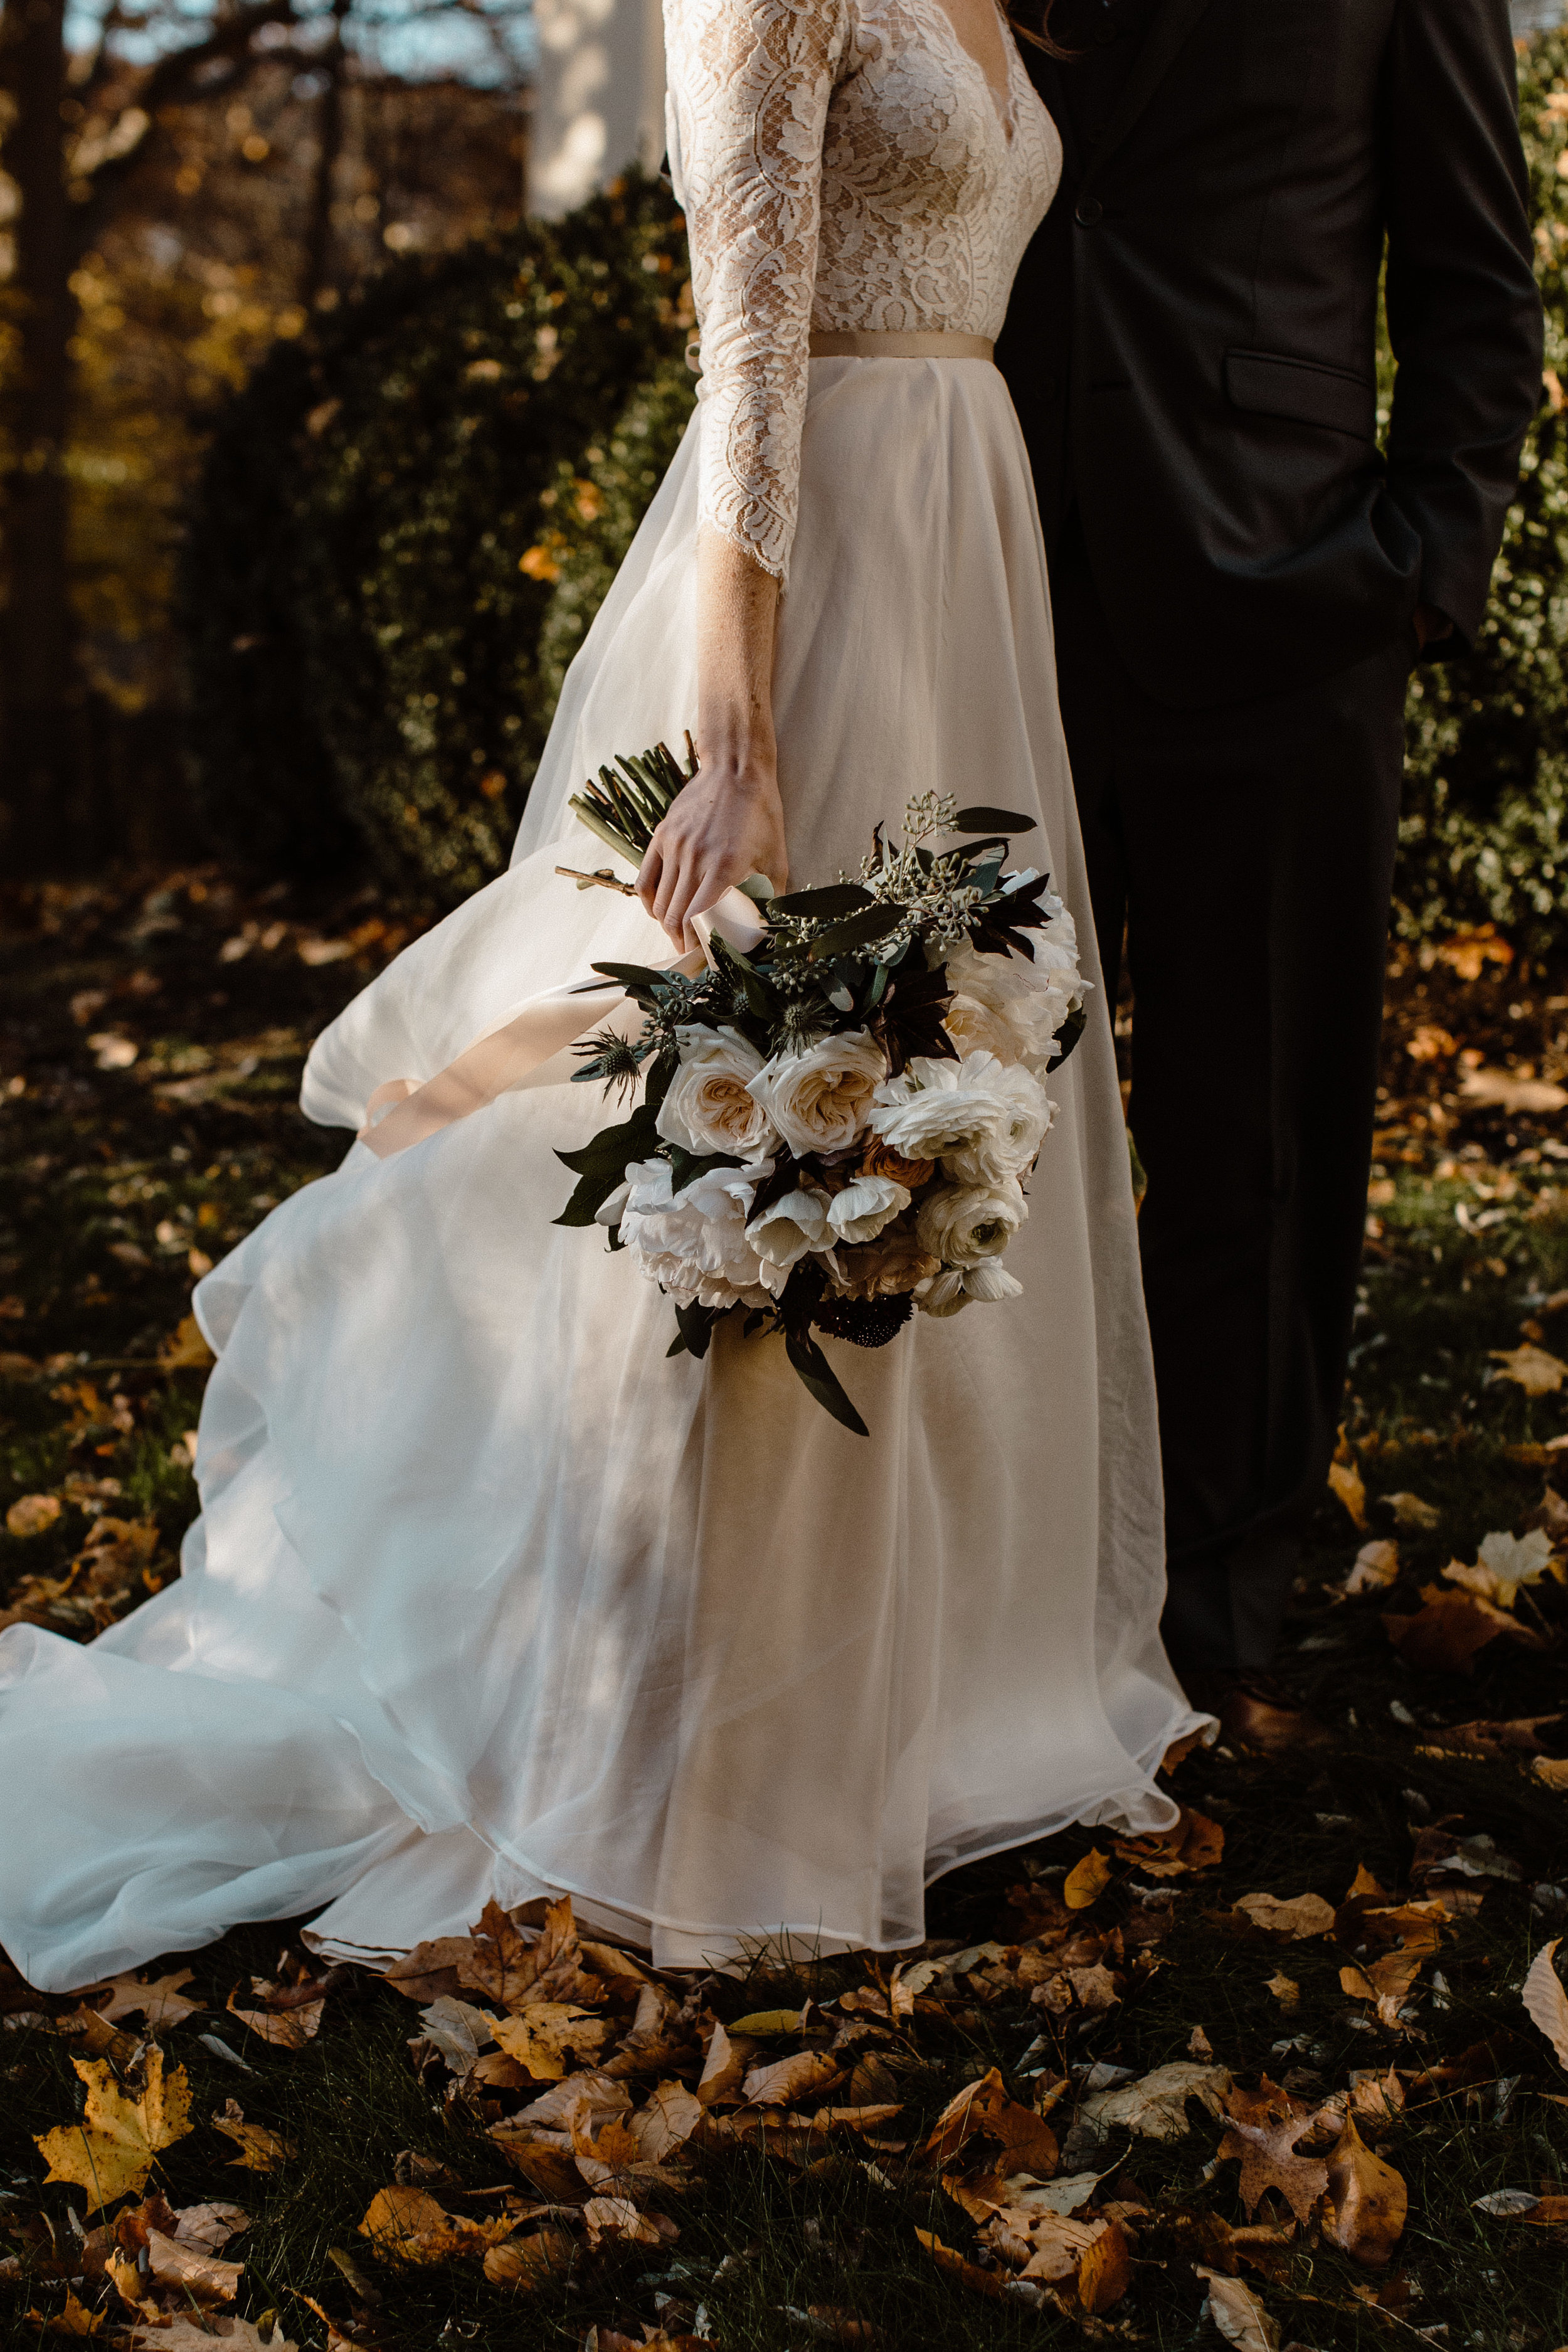 beverly_ma_wedding-9.jpg